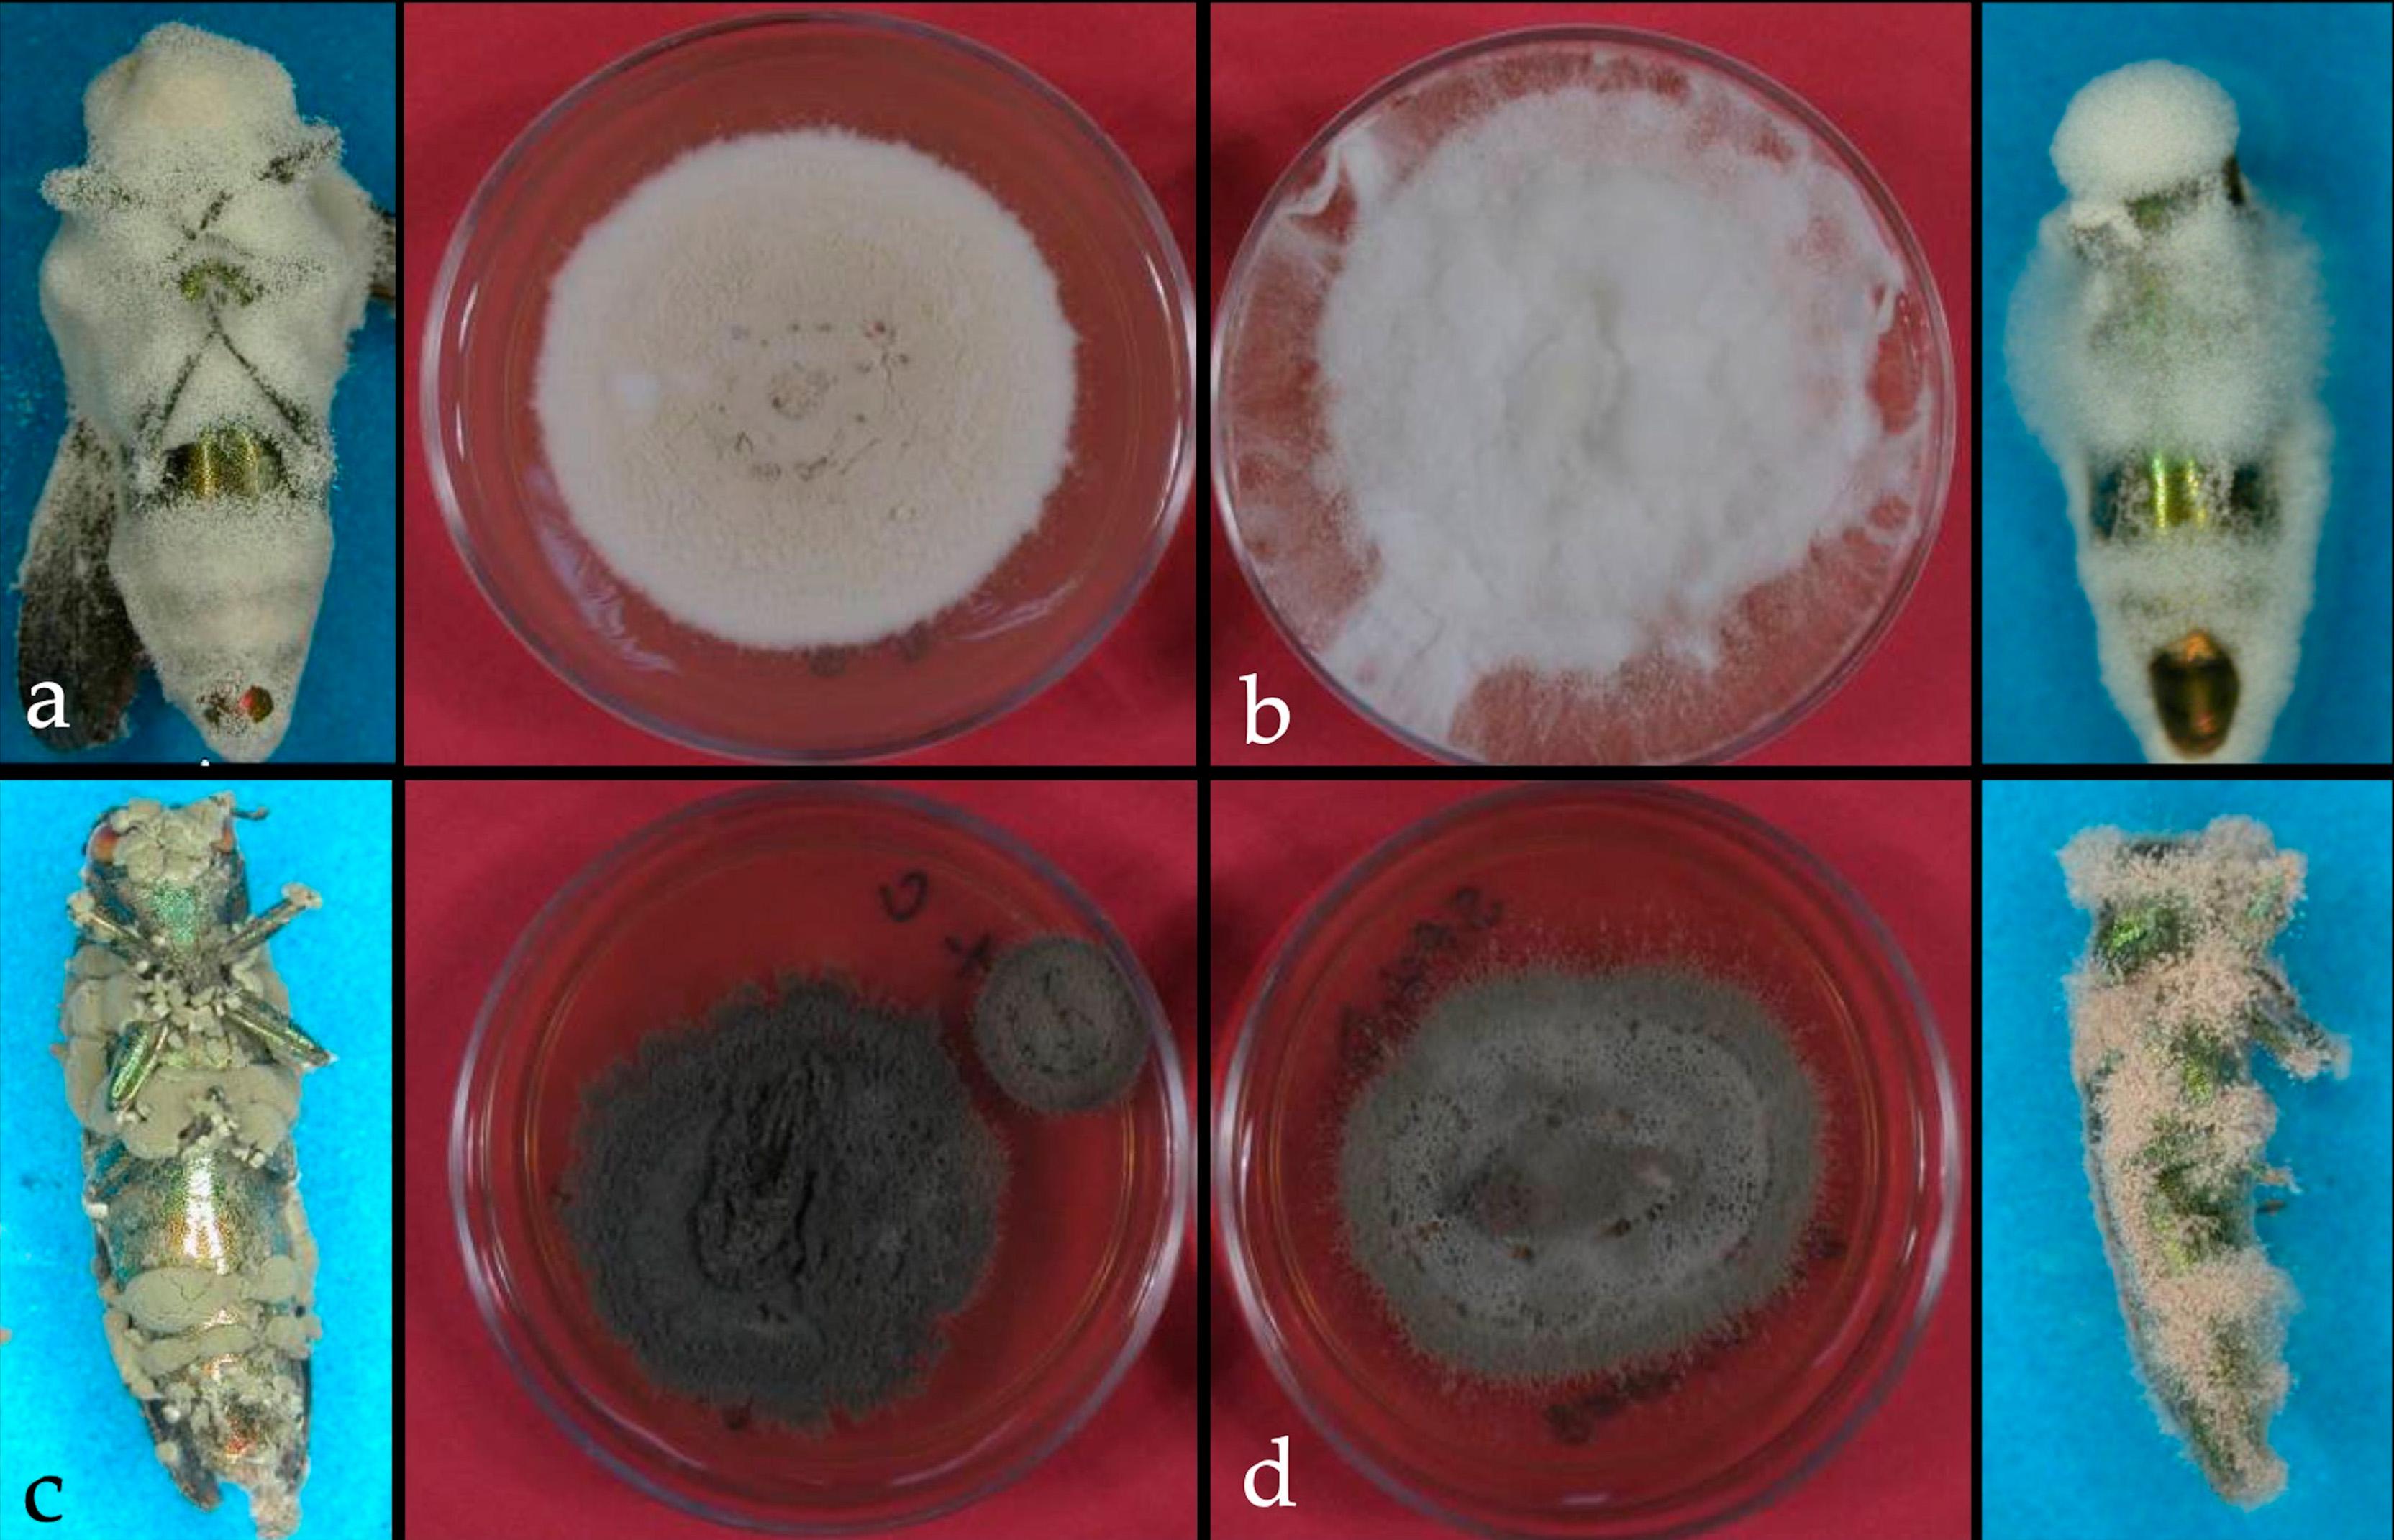 Dara et al 2019 Entomopathogenic fungi on Agrilus planipennis